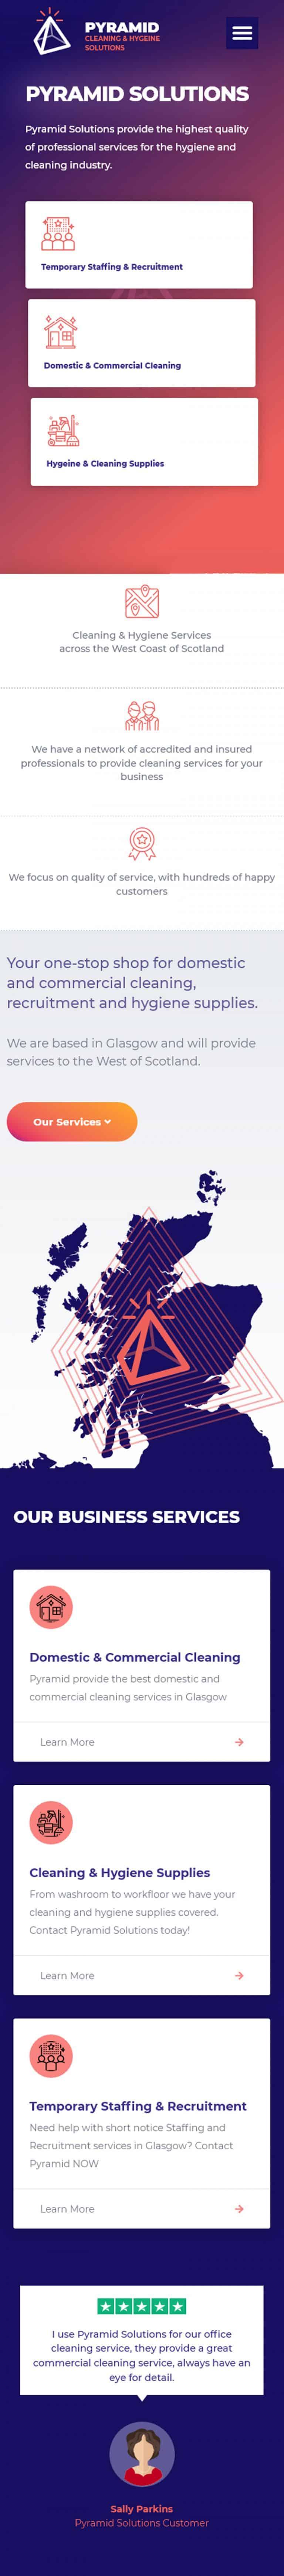 mobile web developer in Glasgow